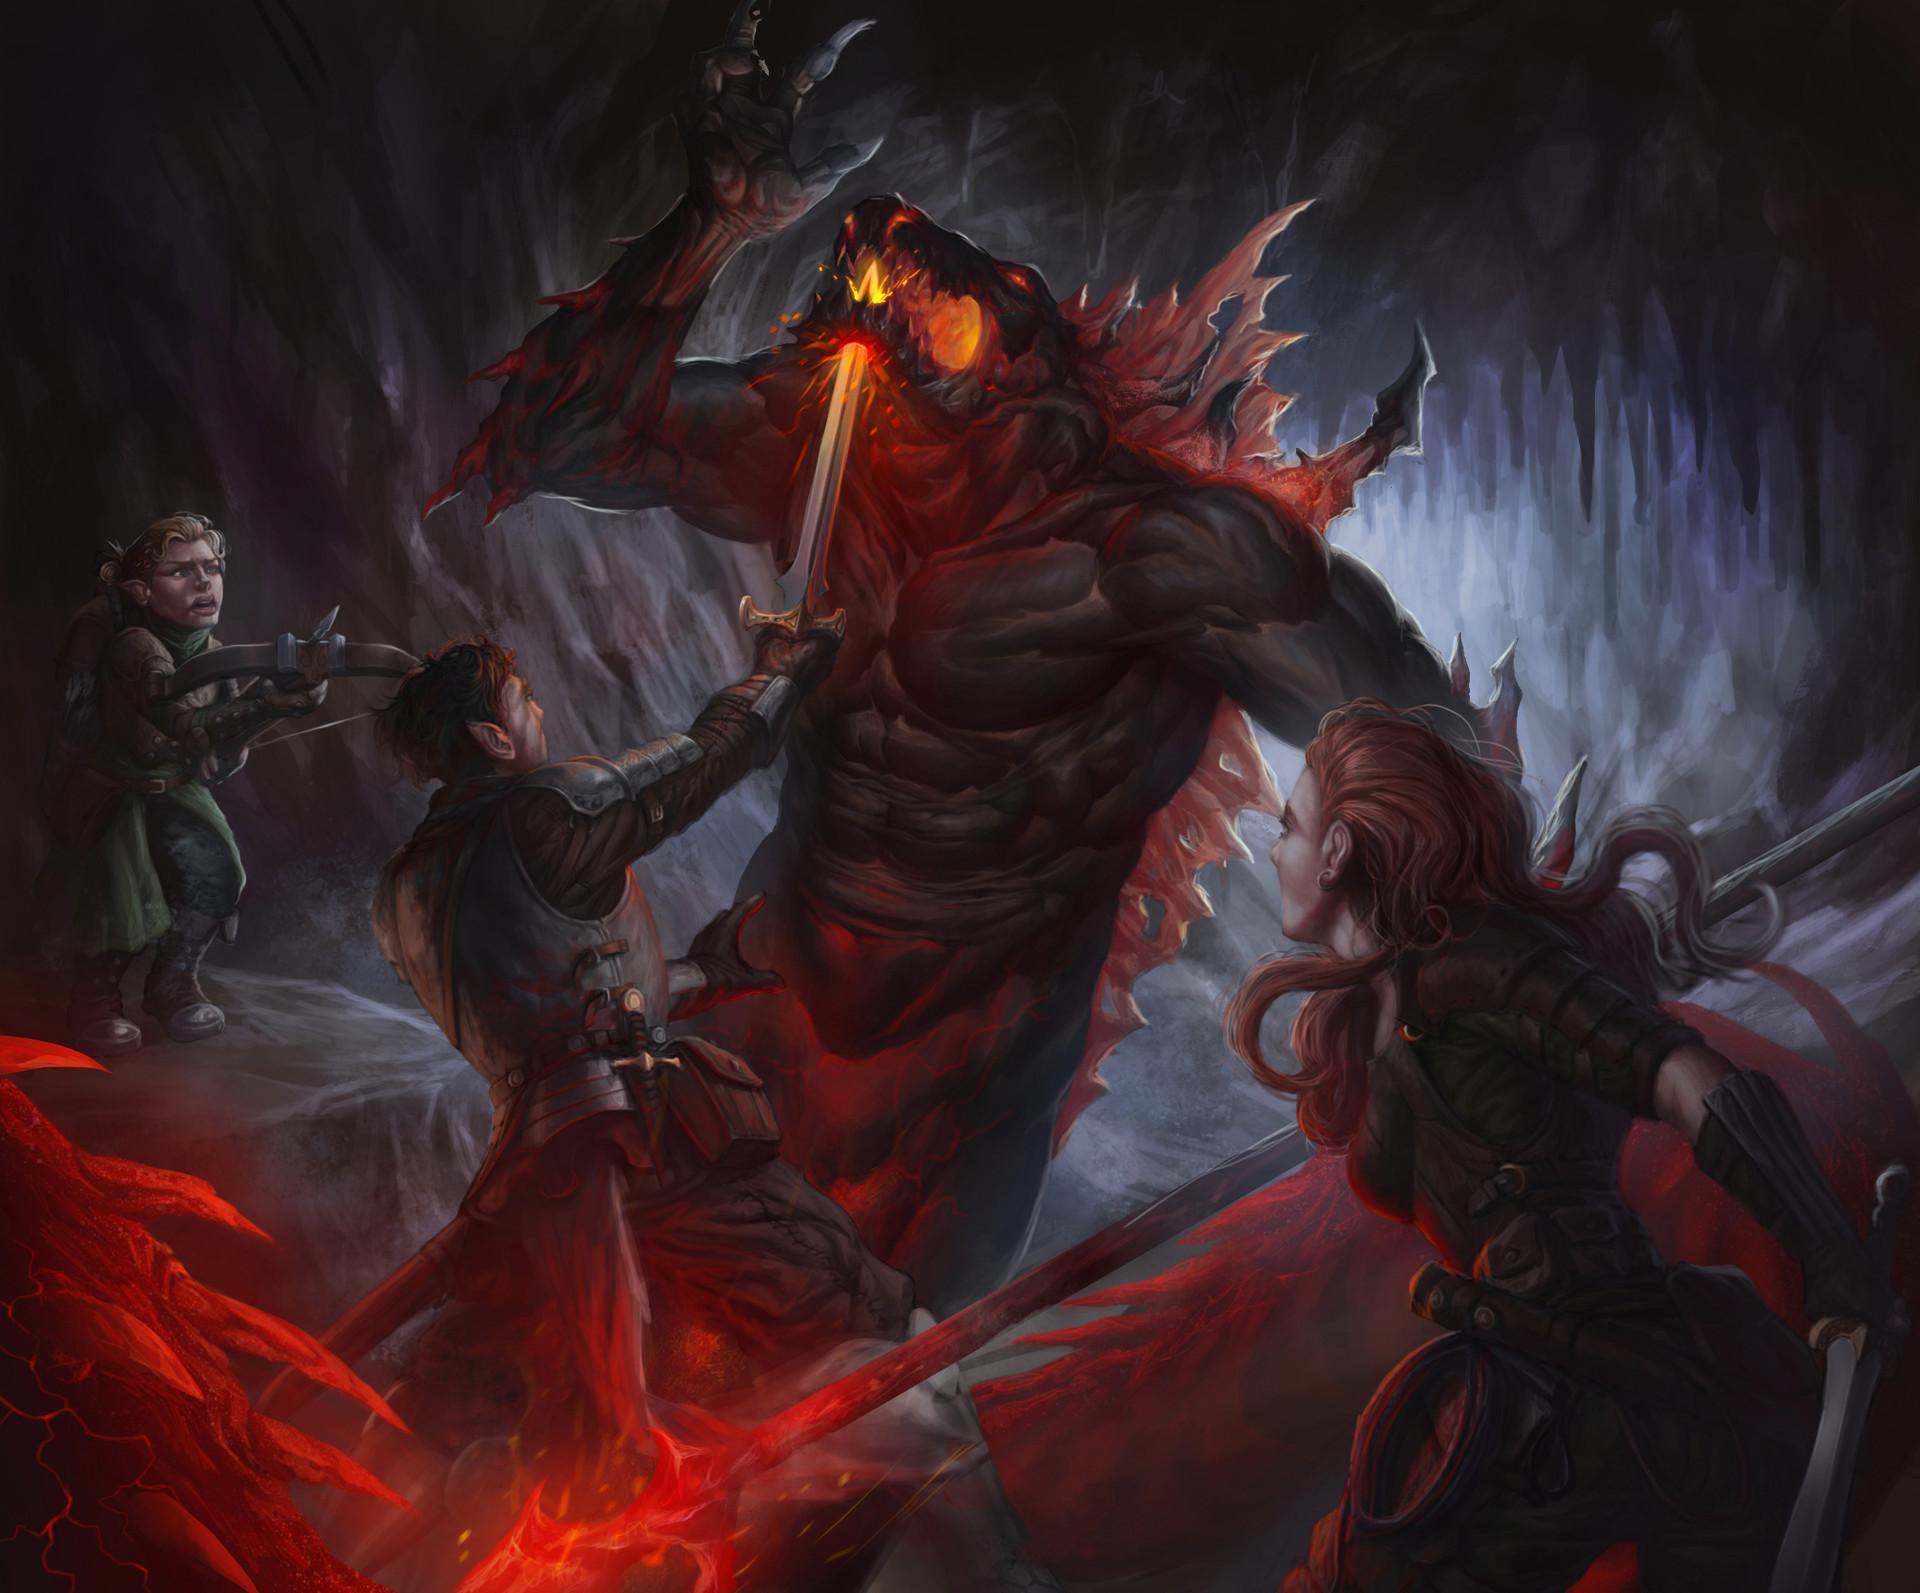 ArtStation - D&D battle, Carlos Jaramillo